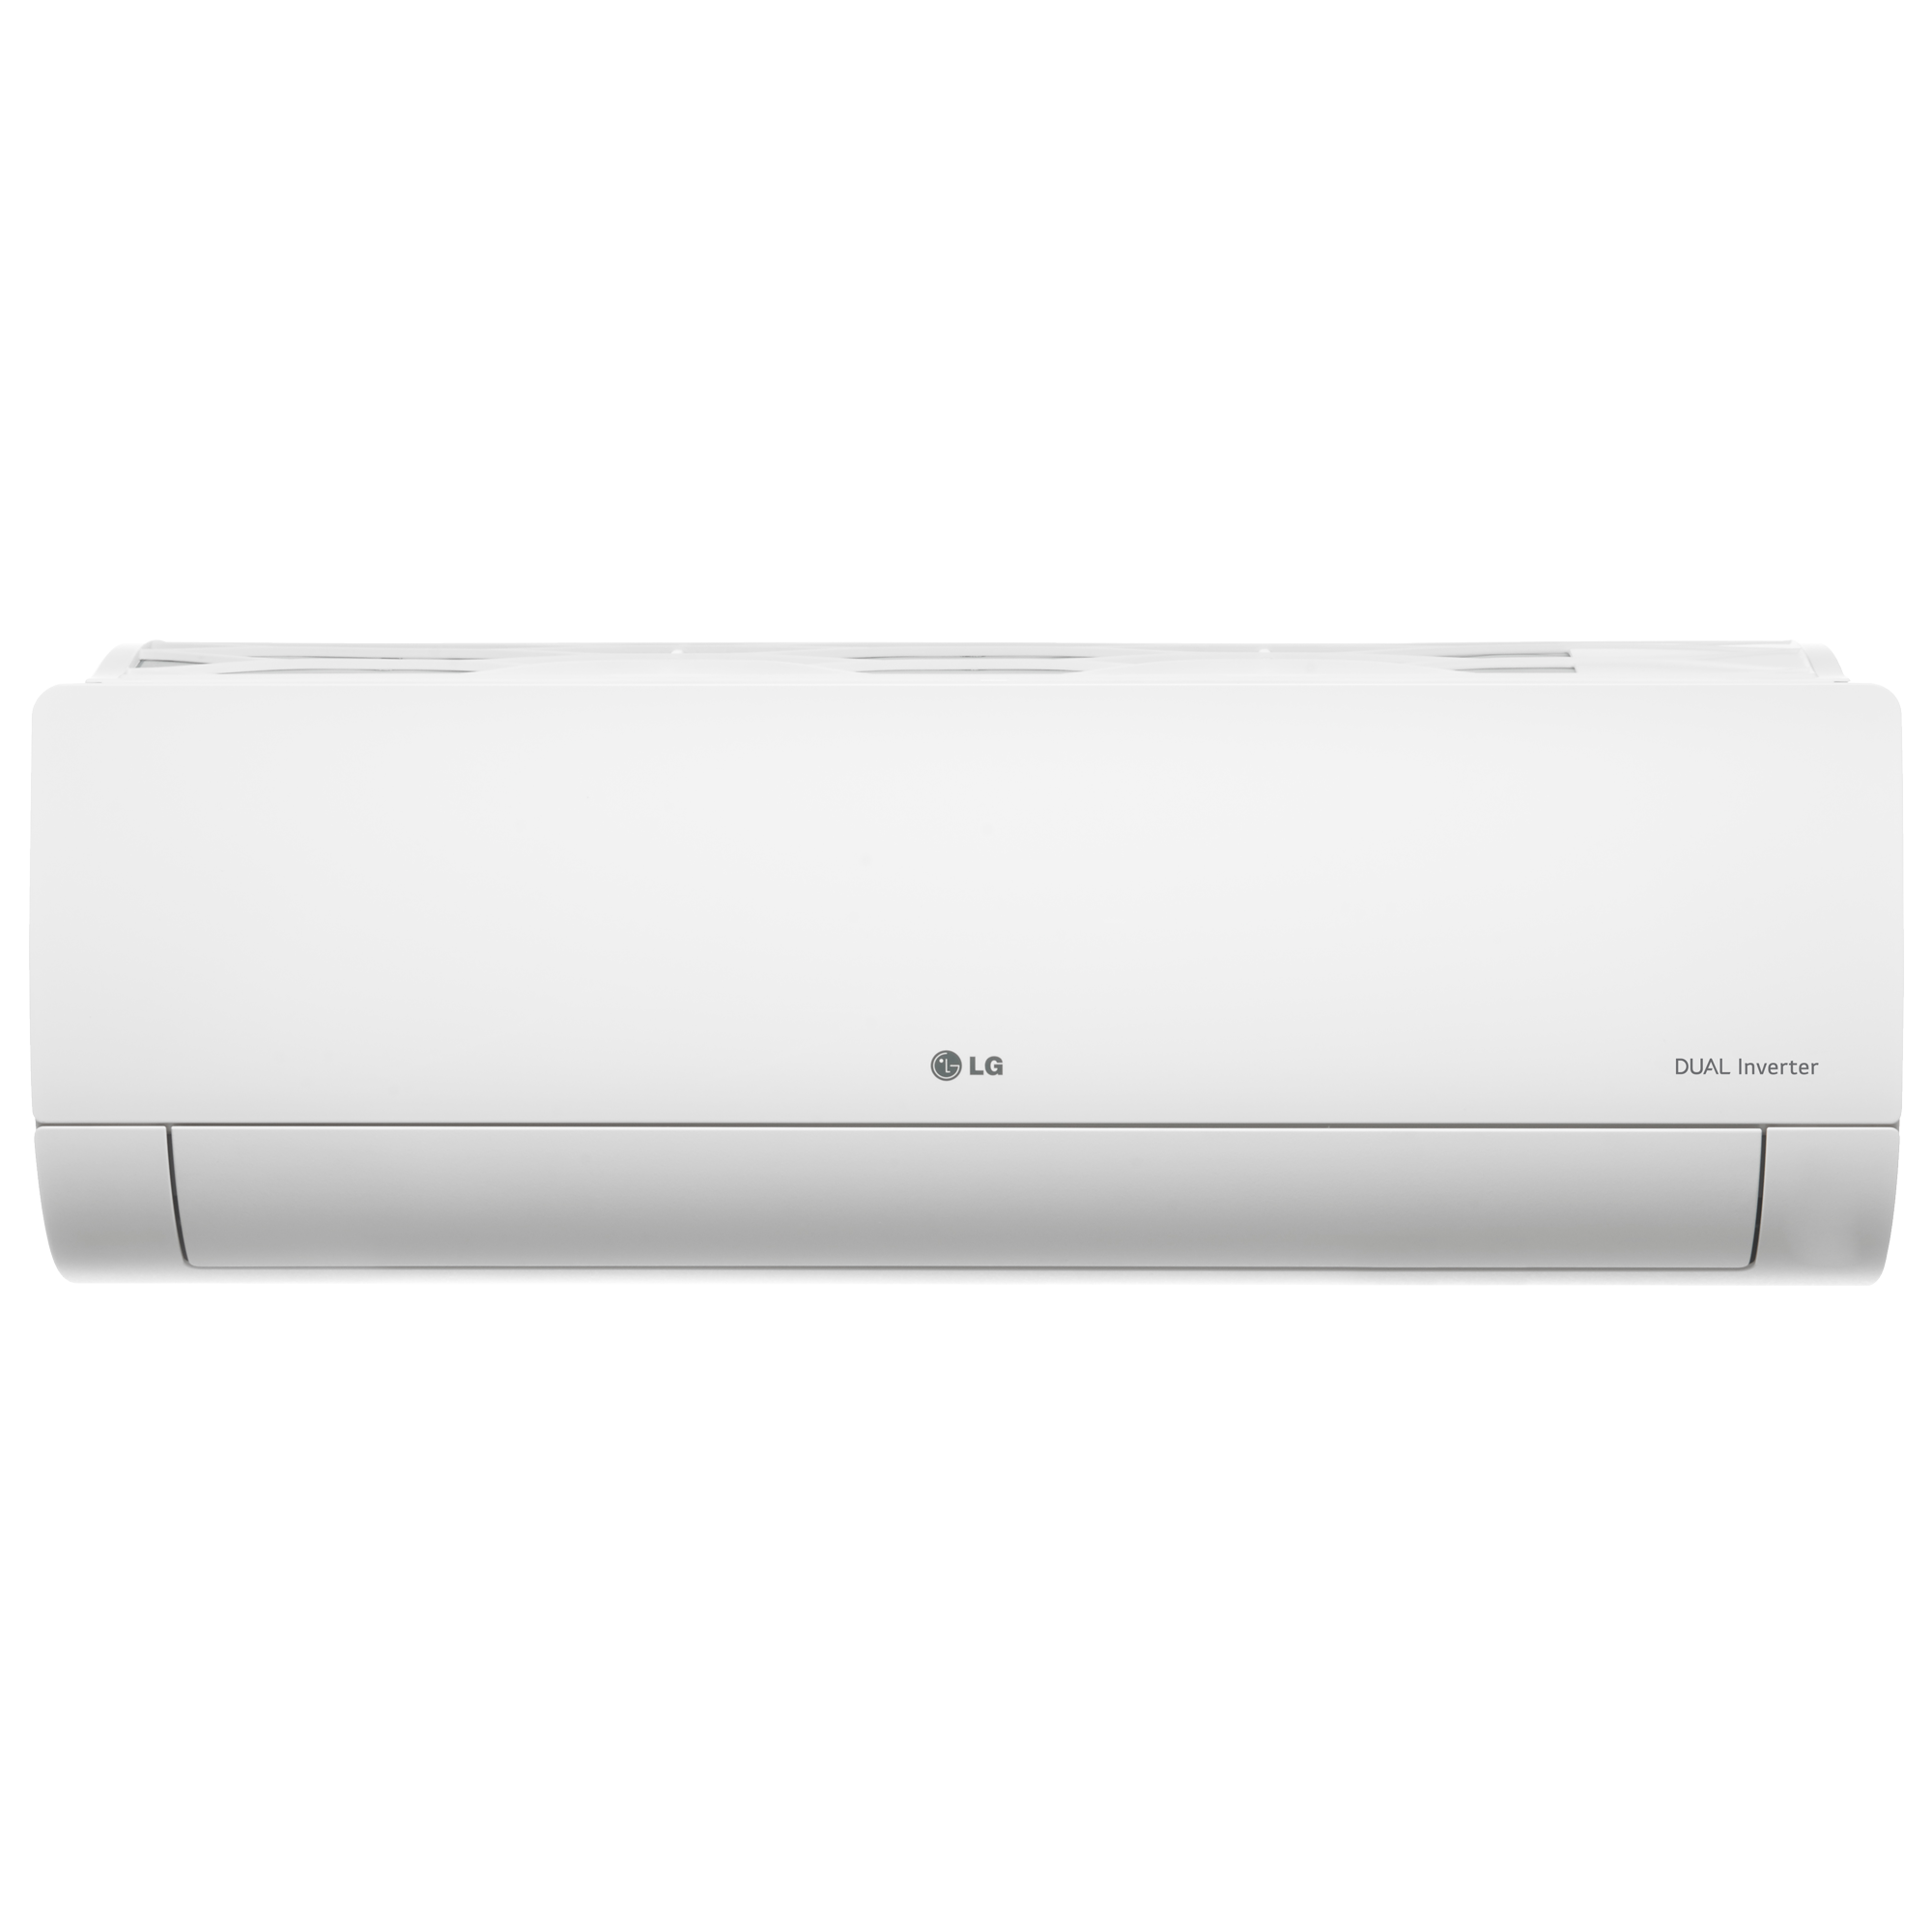 LG 1.5 Ton 4 Star Inverter Split AC (Air Purification Filter, Copper Condenser, MS-Q18ANYA, White)_1